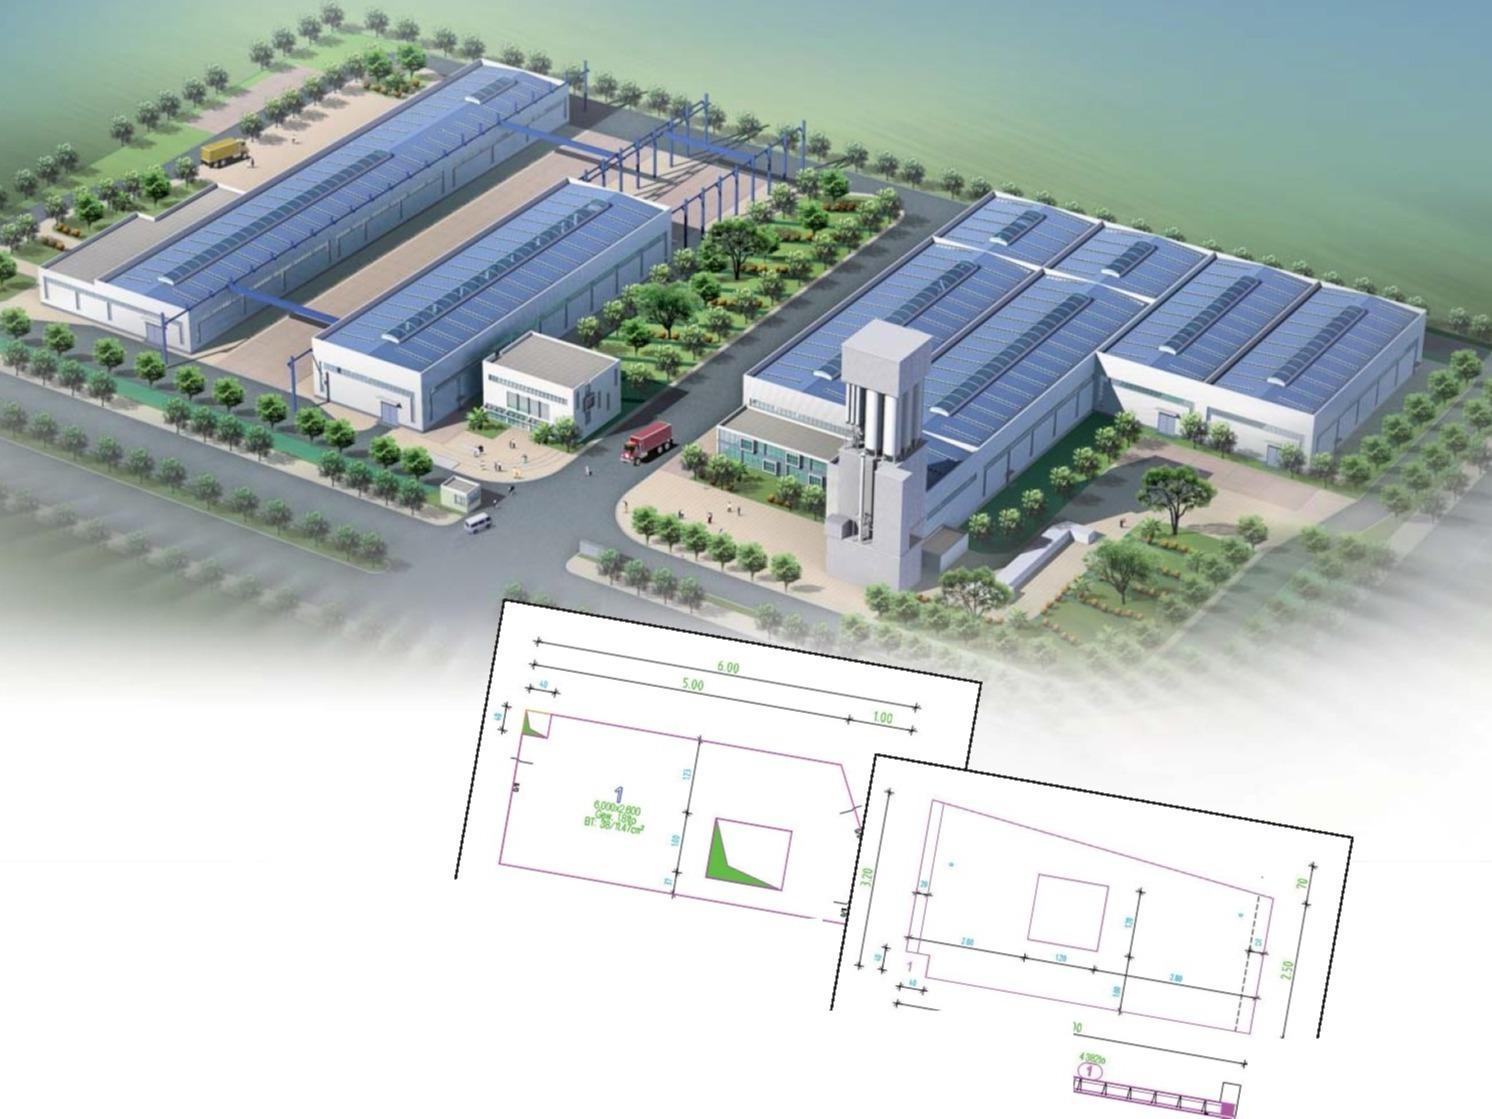 Planbar建筑工业4.0BIM软件